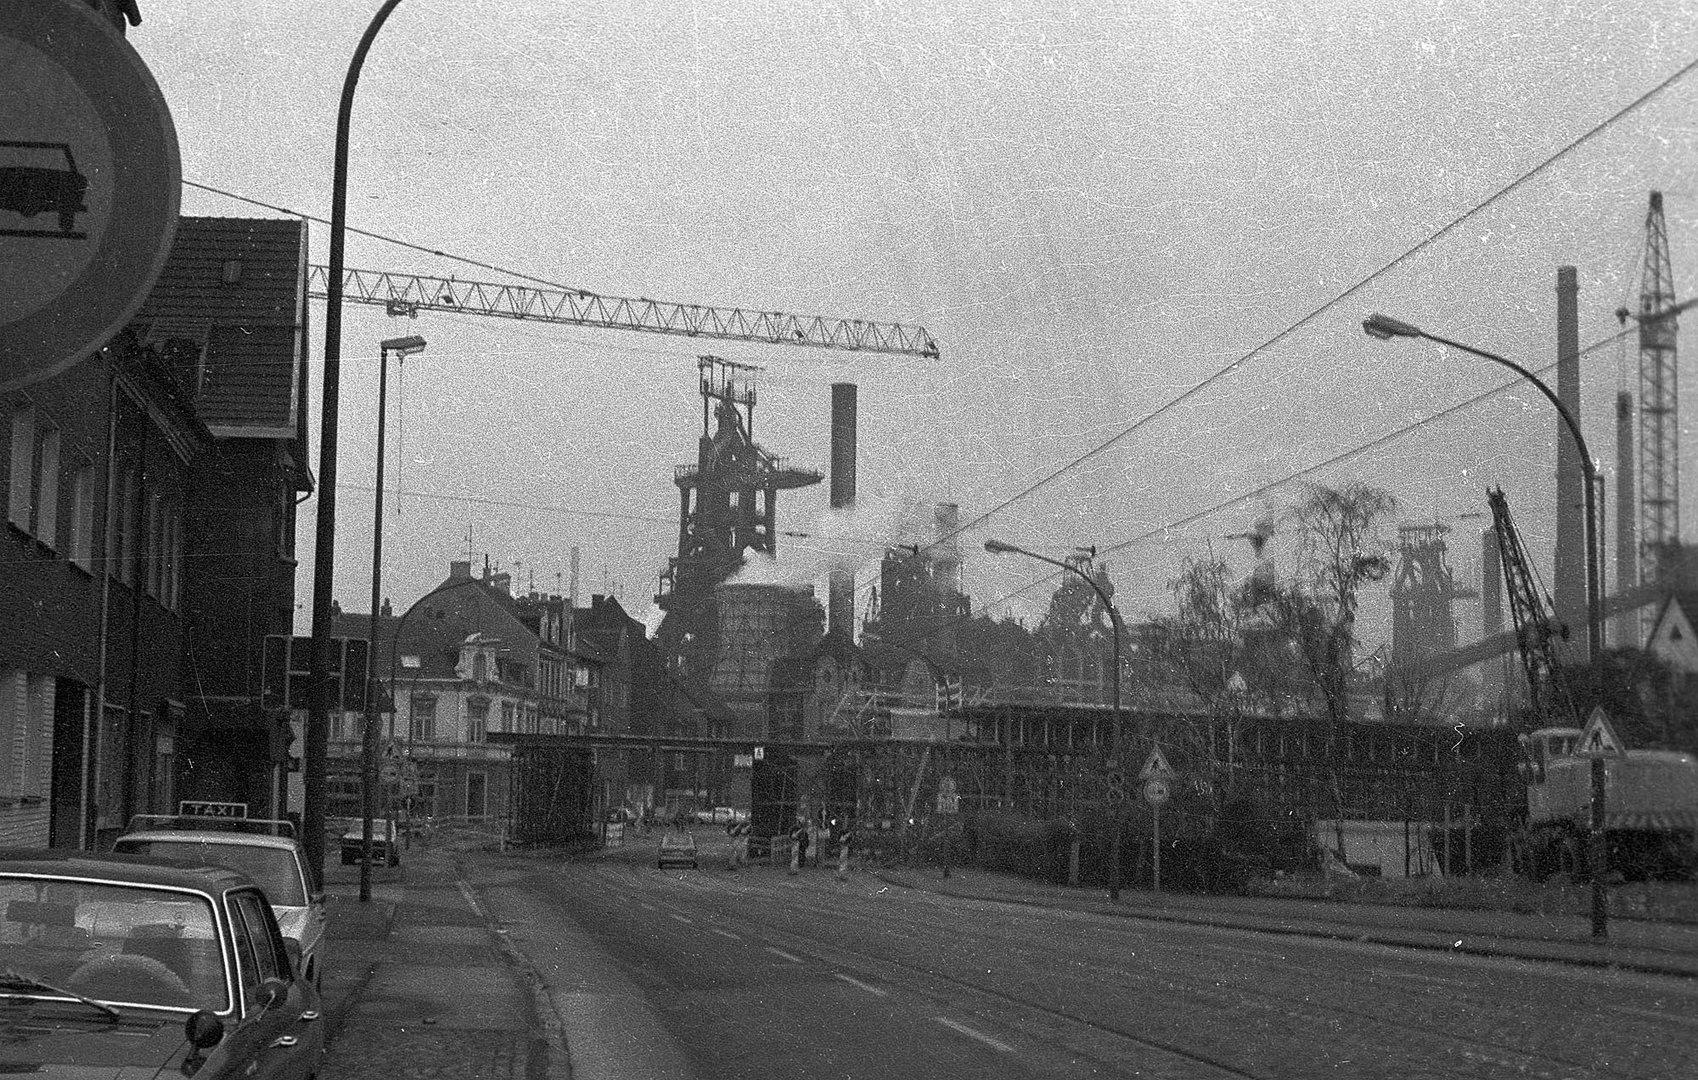 Bau Autobahnbrücke A42, Duisburg Beeck 1977